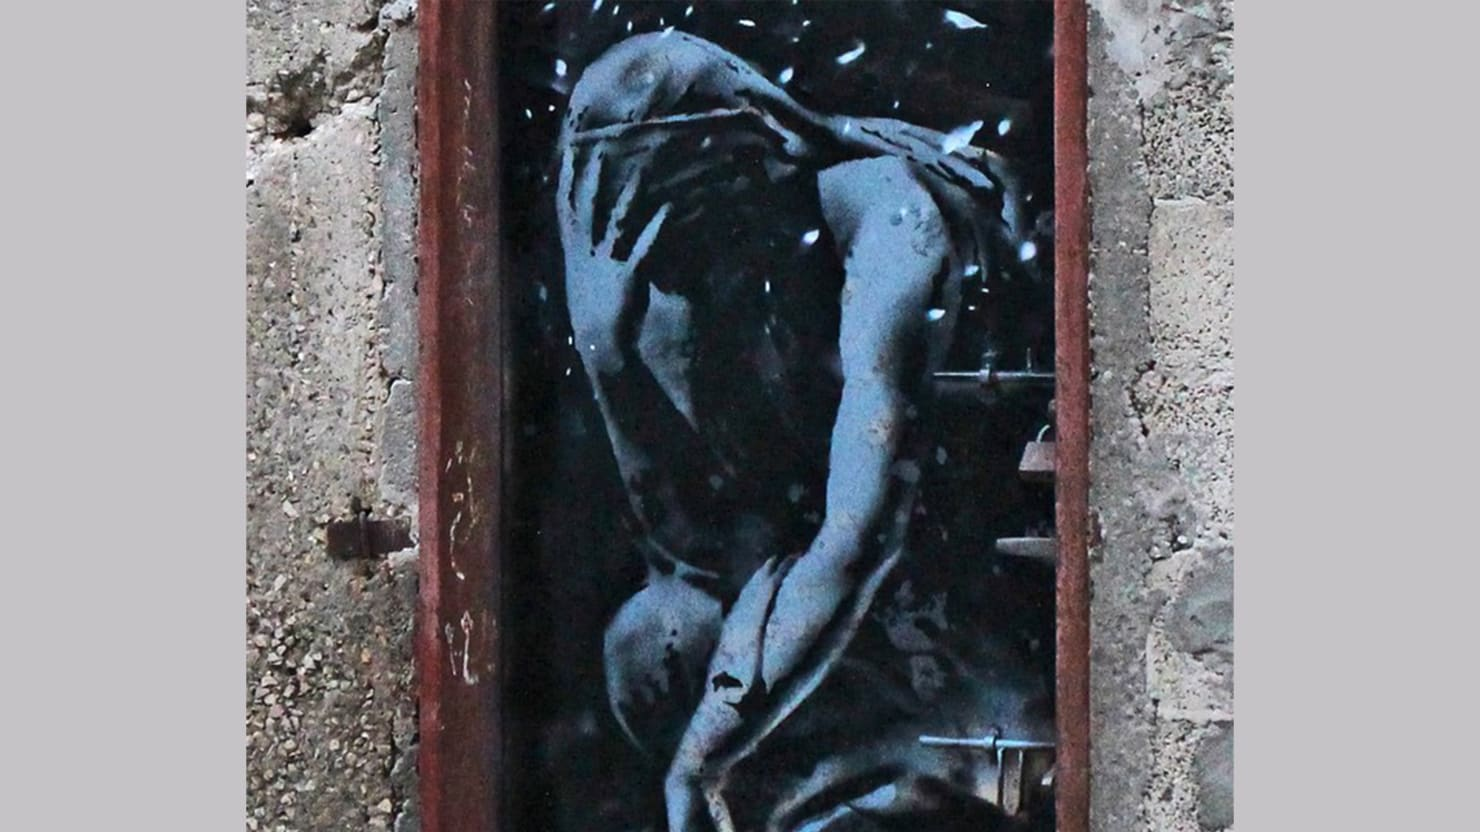 Banksy's Grim Tour of Gaza: Watch a Mini Documentary by the Shadowy Street Artist